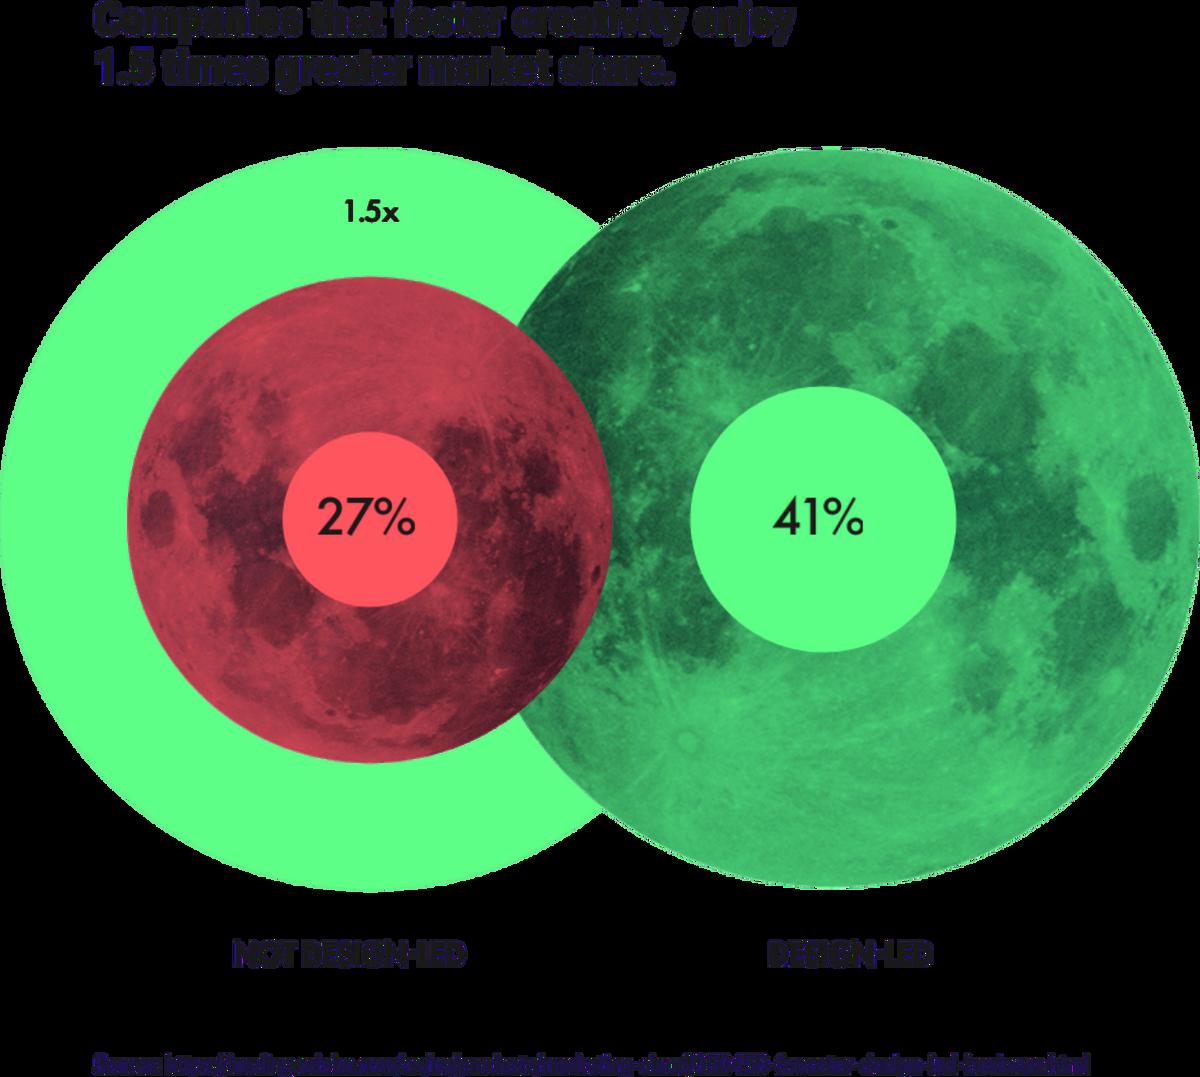 companies that foster creativity enjoy 1.5x more market share